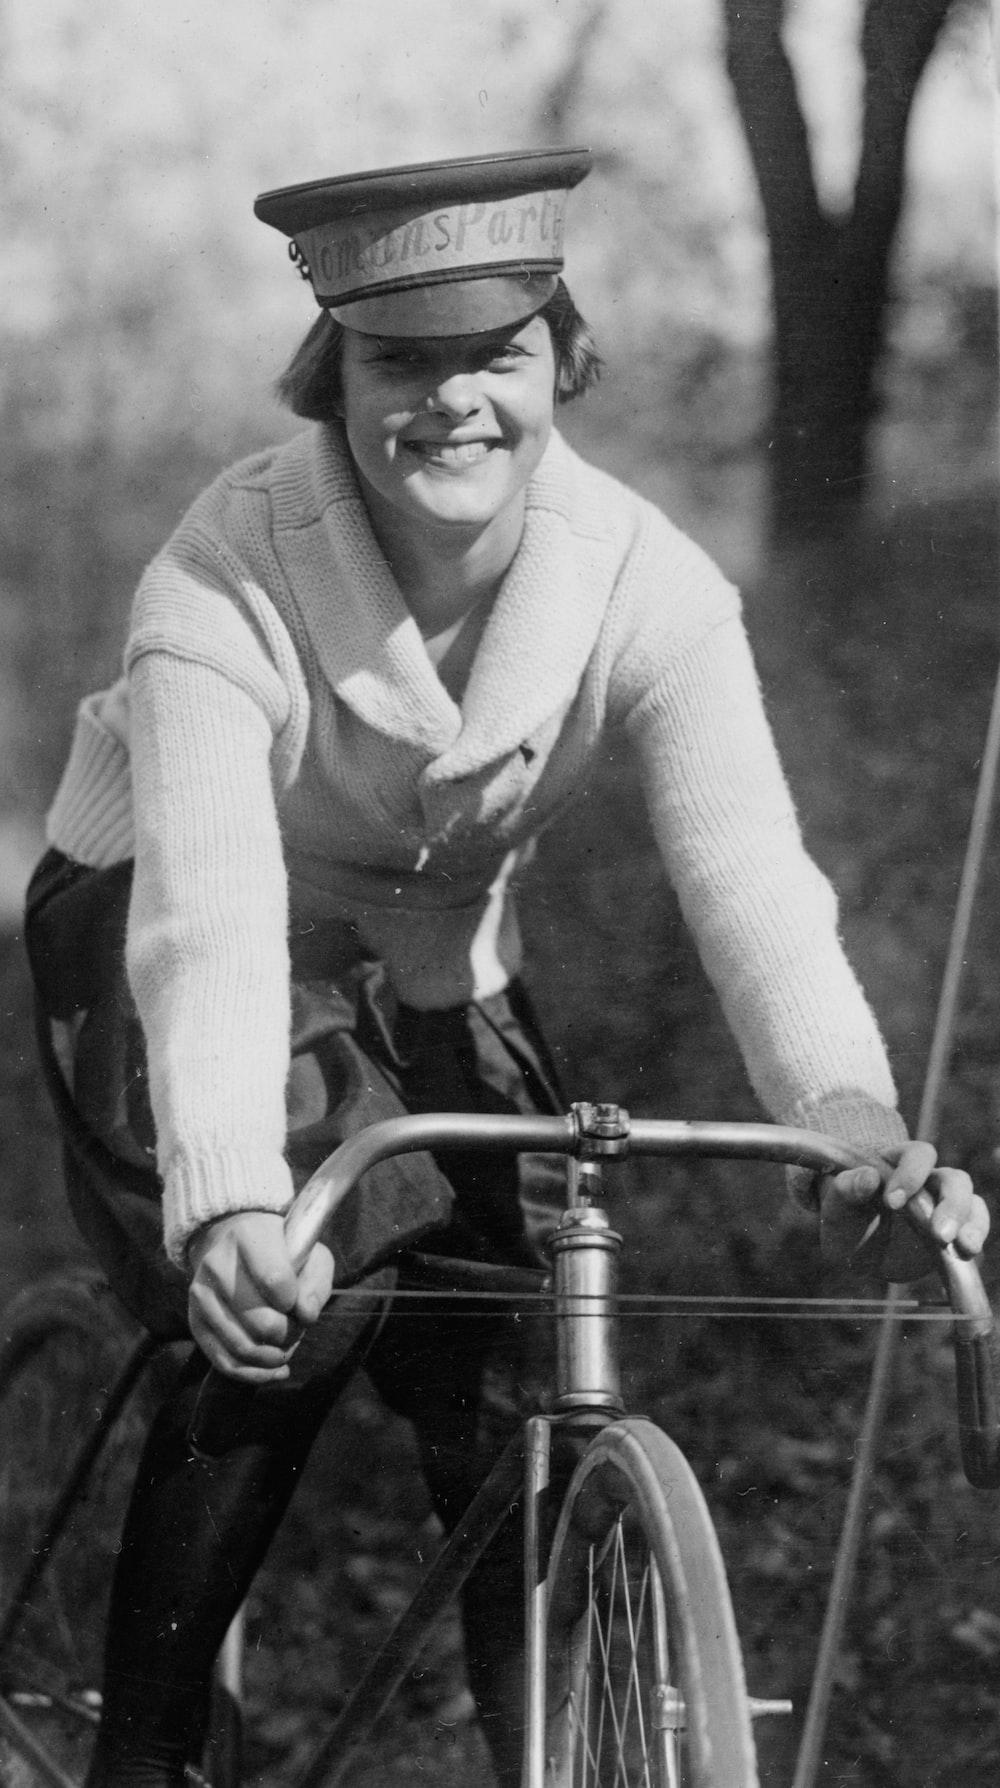 Julia Obear on bike